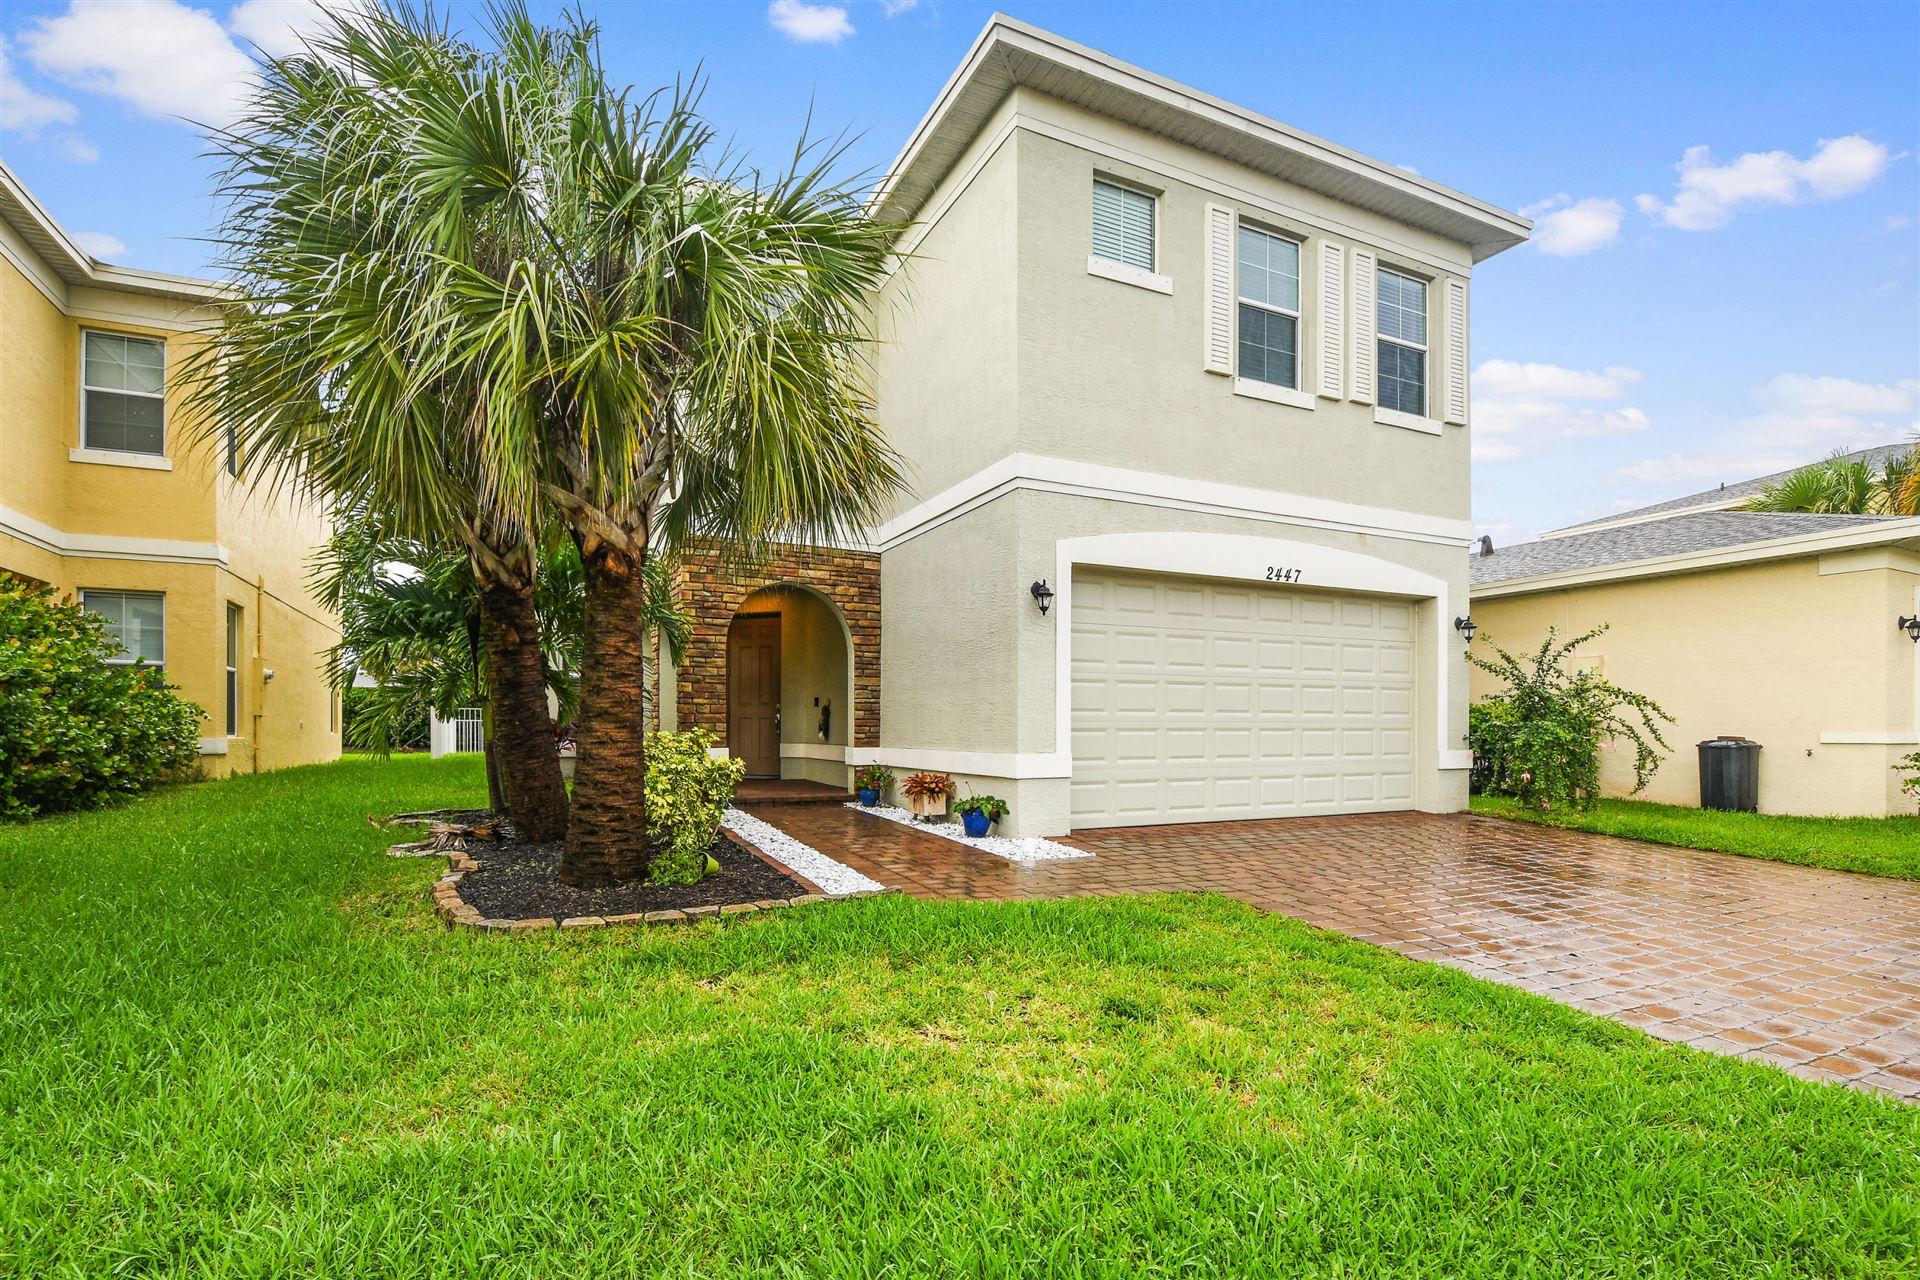 2447 NW Padova Street, Port Saint Lucie, FL 34986 - #: RX-10632395